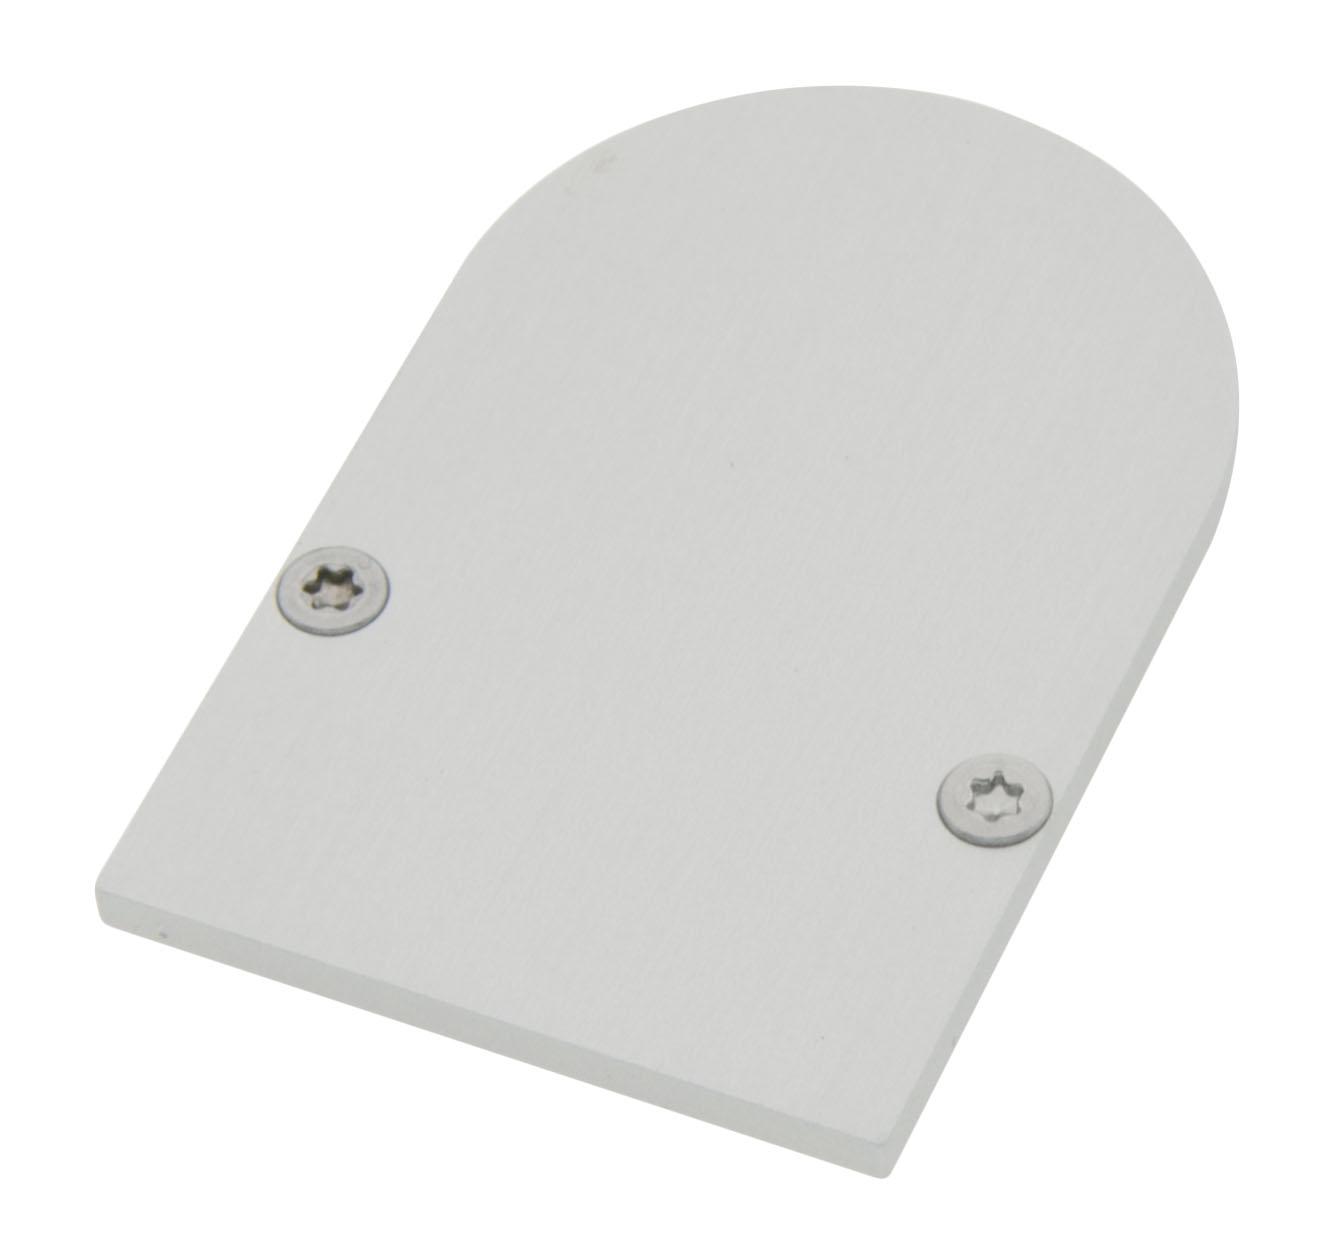 1 Stk Profil Endkappe CLR Rund geschlossen inkl. Schrauben LIEK006210